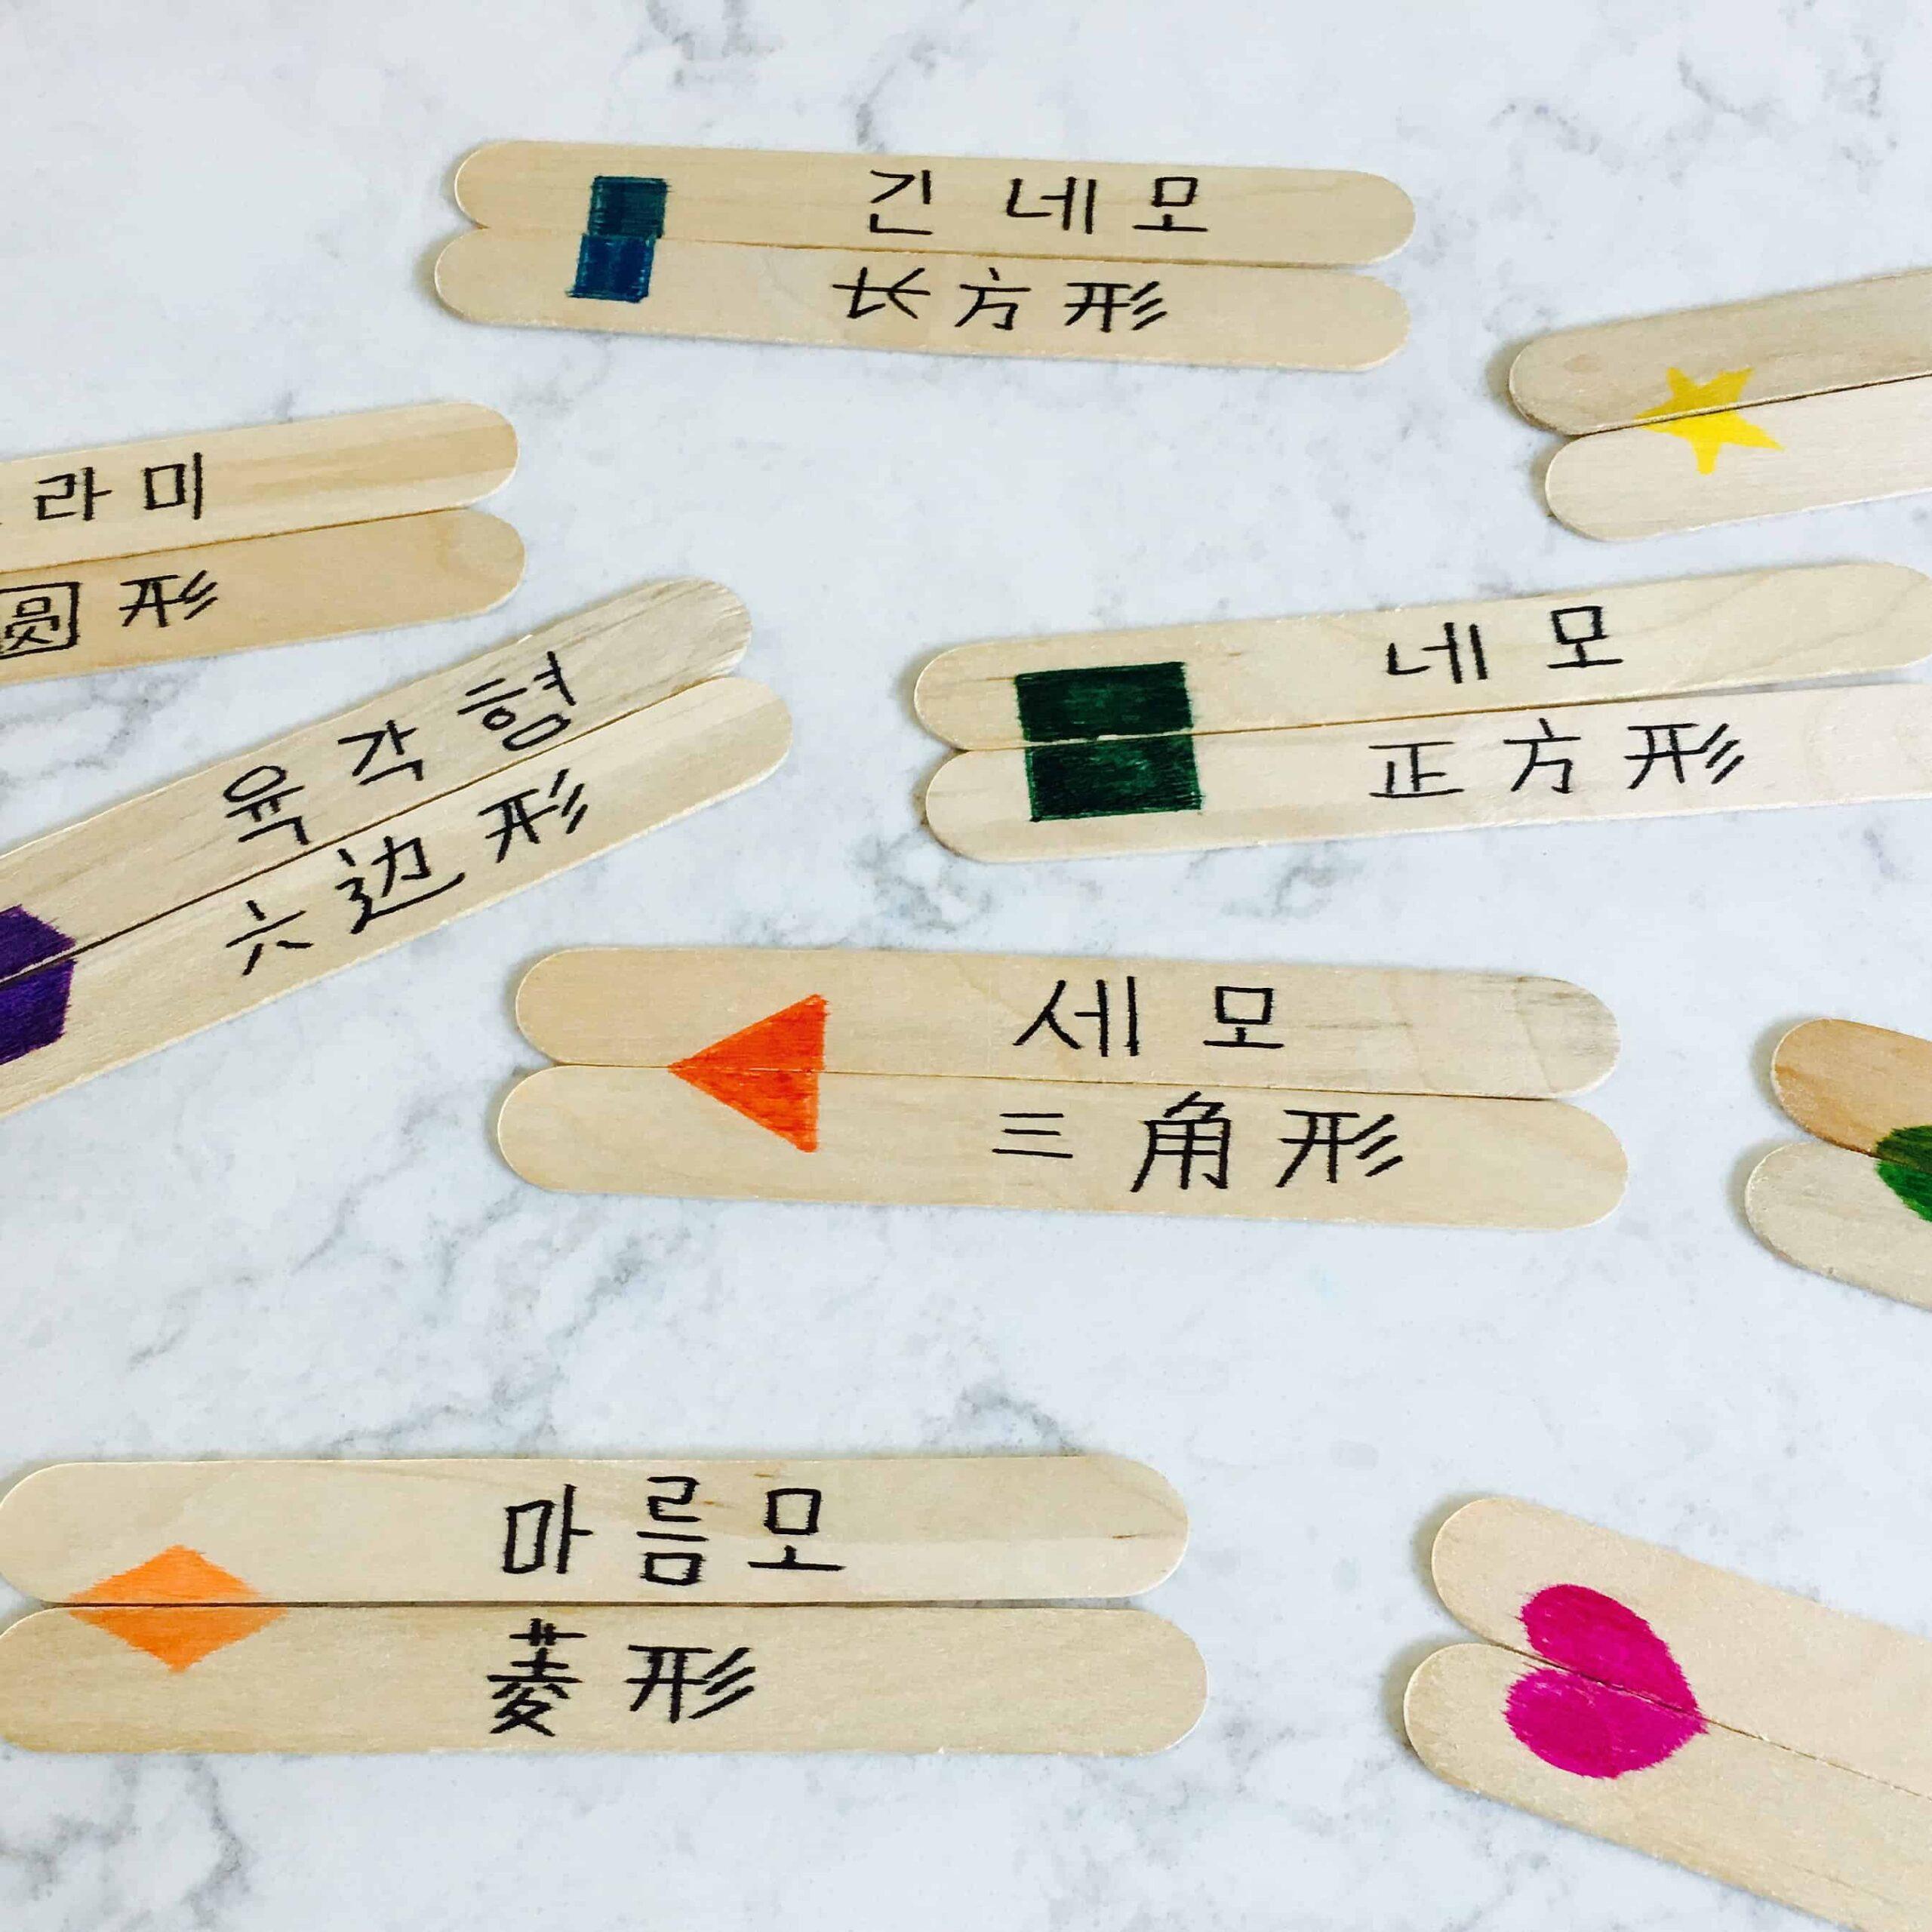 Bilingual Craft Stick Shape Puzzles